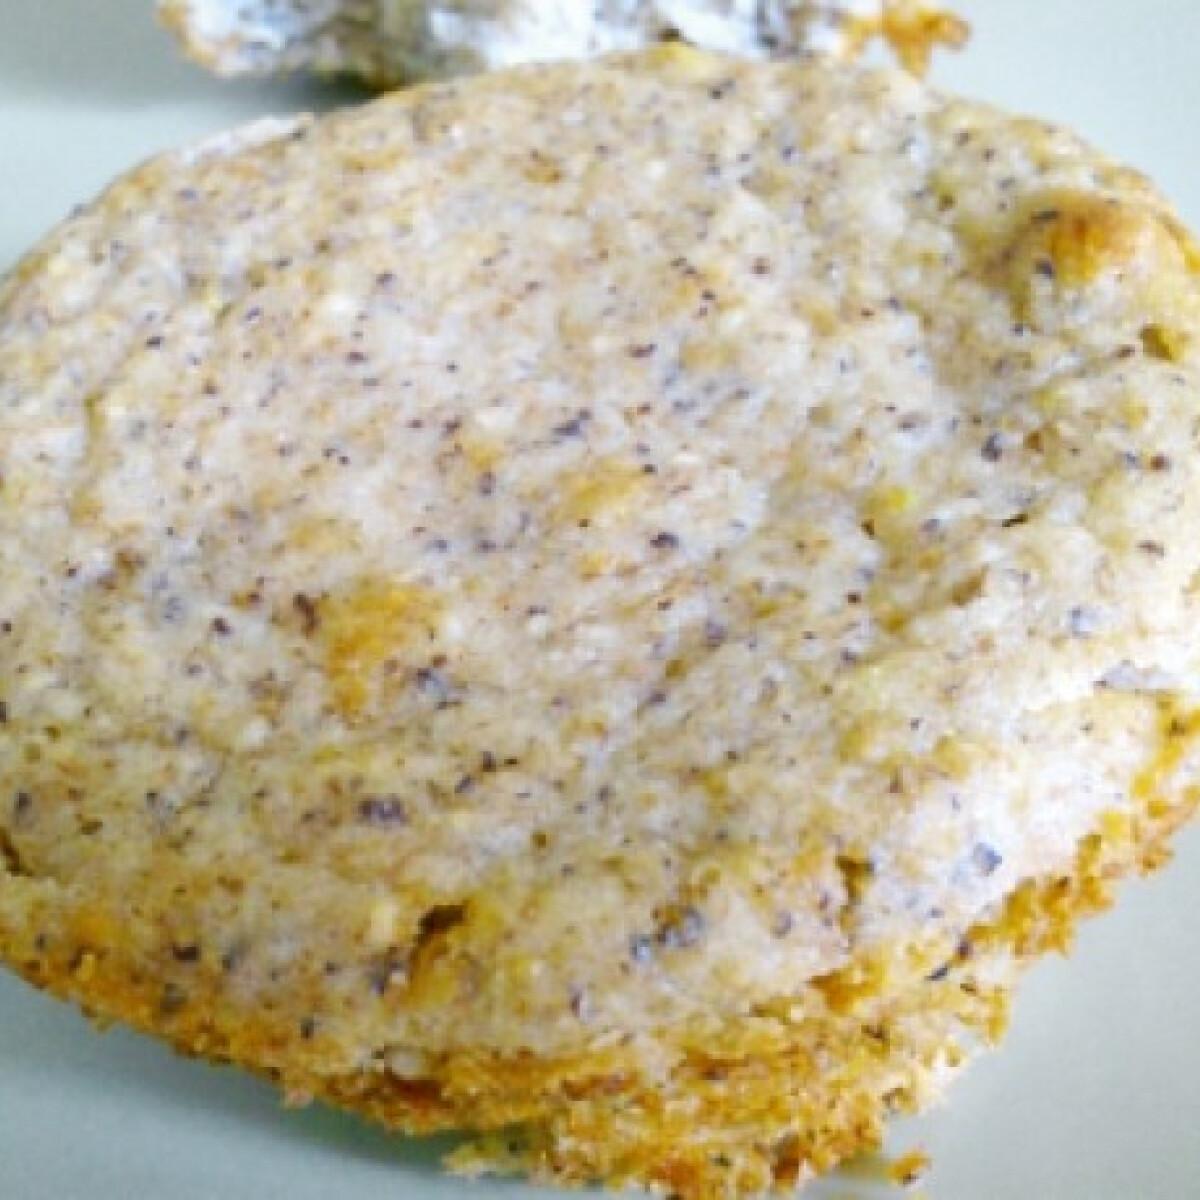 Citromos-mákos muffin Cukormentestől